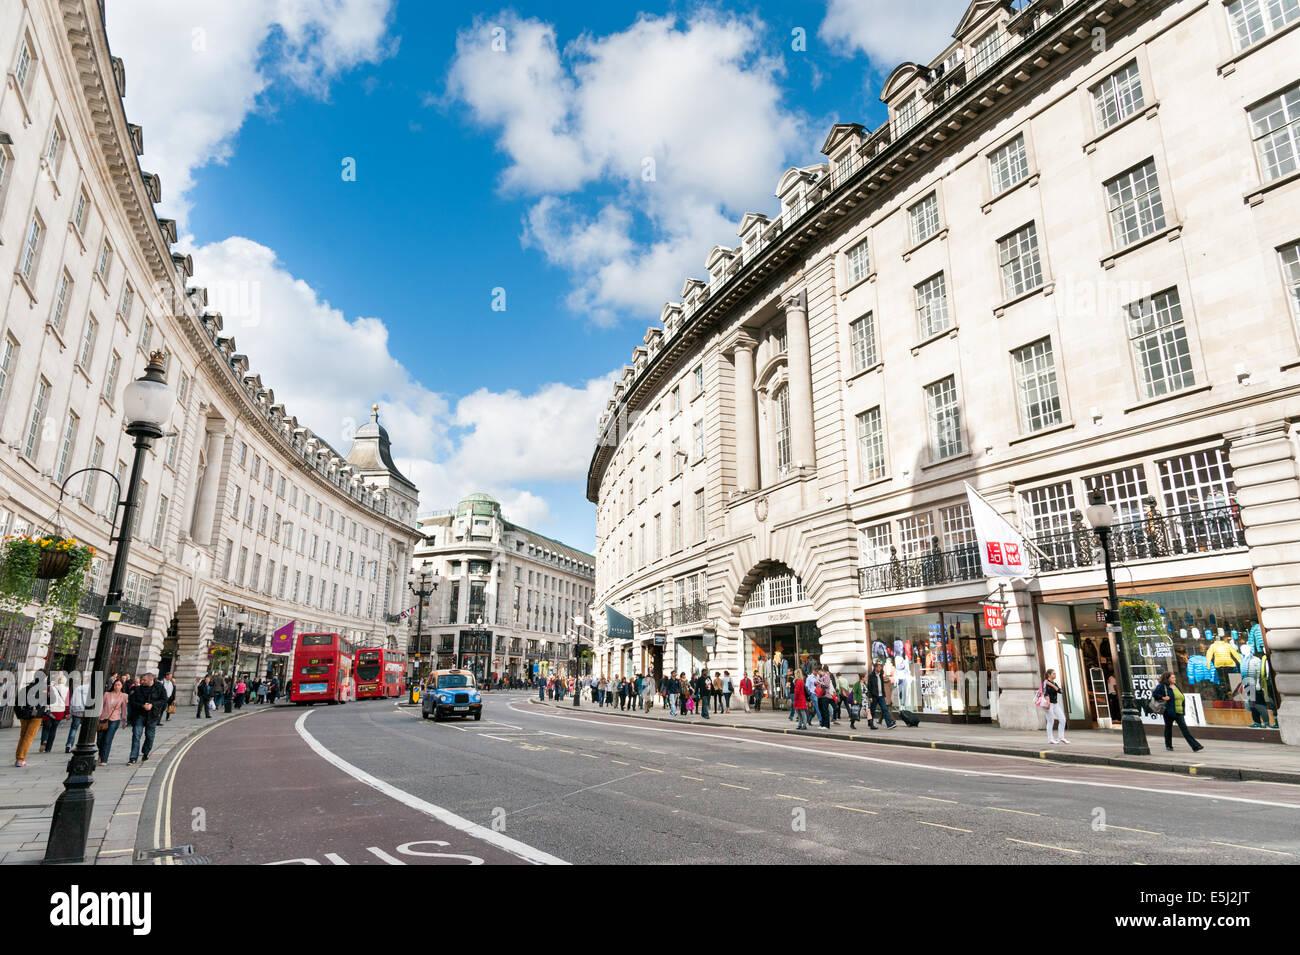 Regent Street, London, England, UK - Stock Image